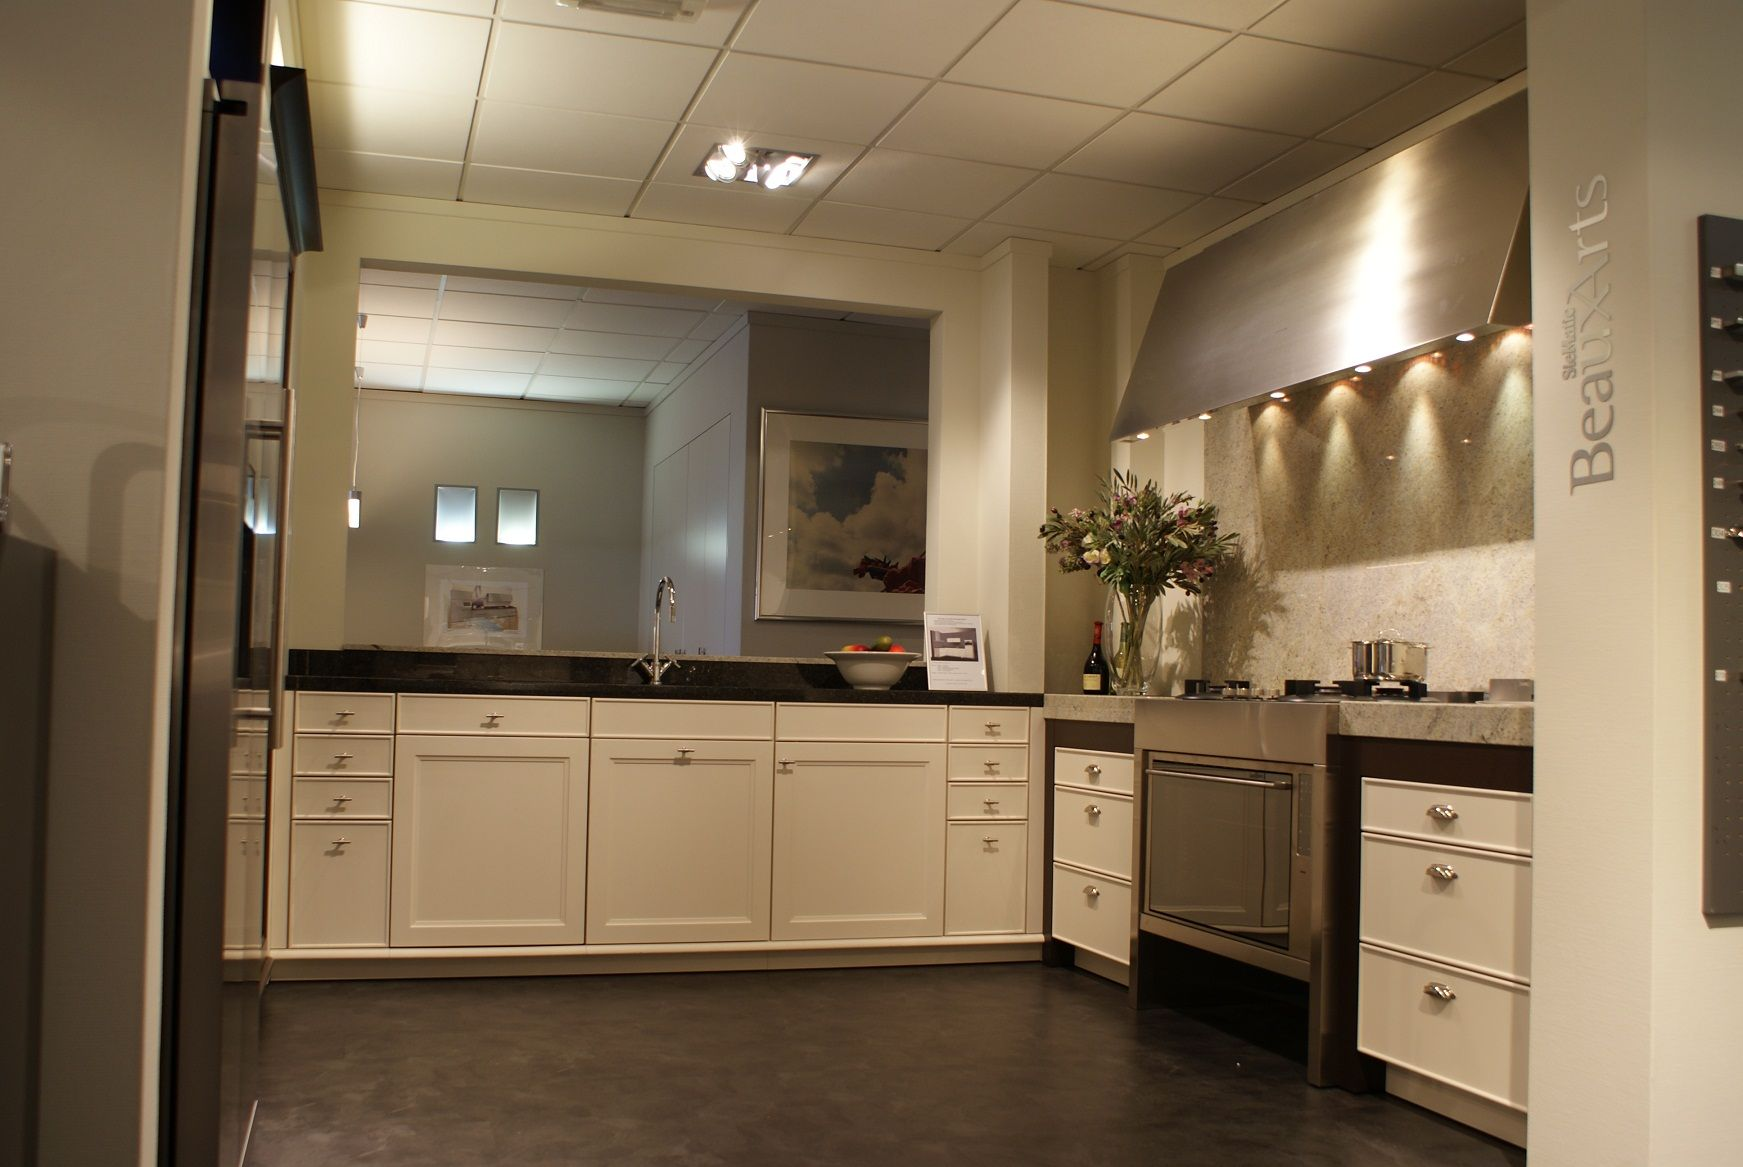 allergrootste keukensite van nederland siematic beauxarts 48691. Black Bedroom Furniture Sets. Home Design Ideas